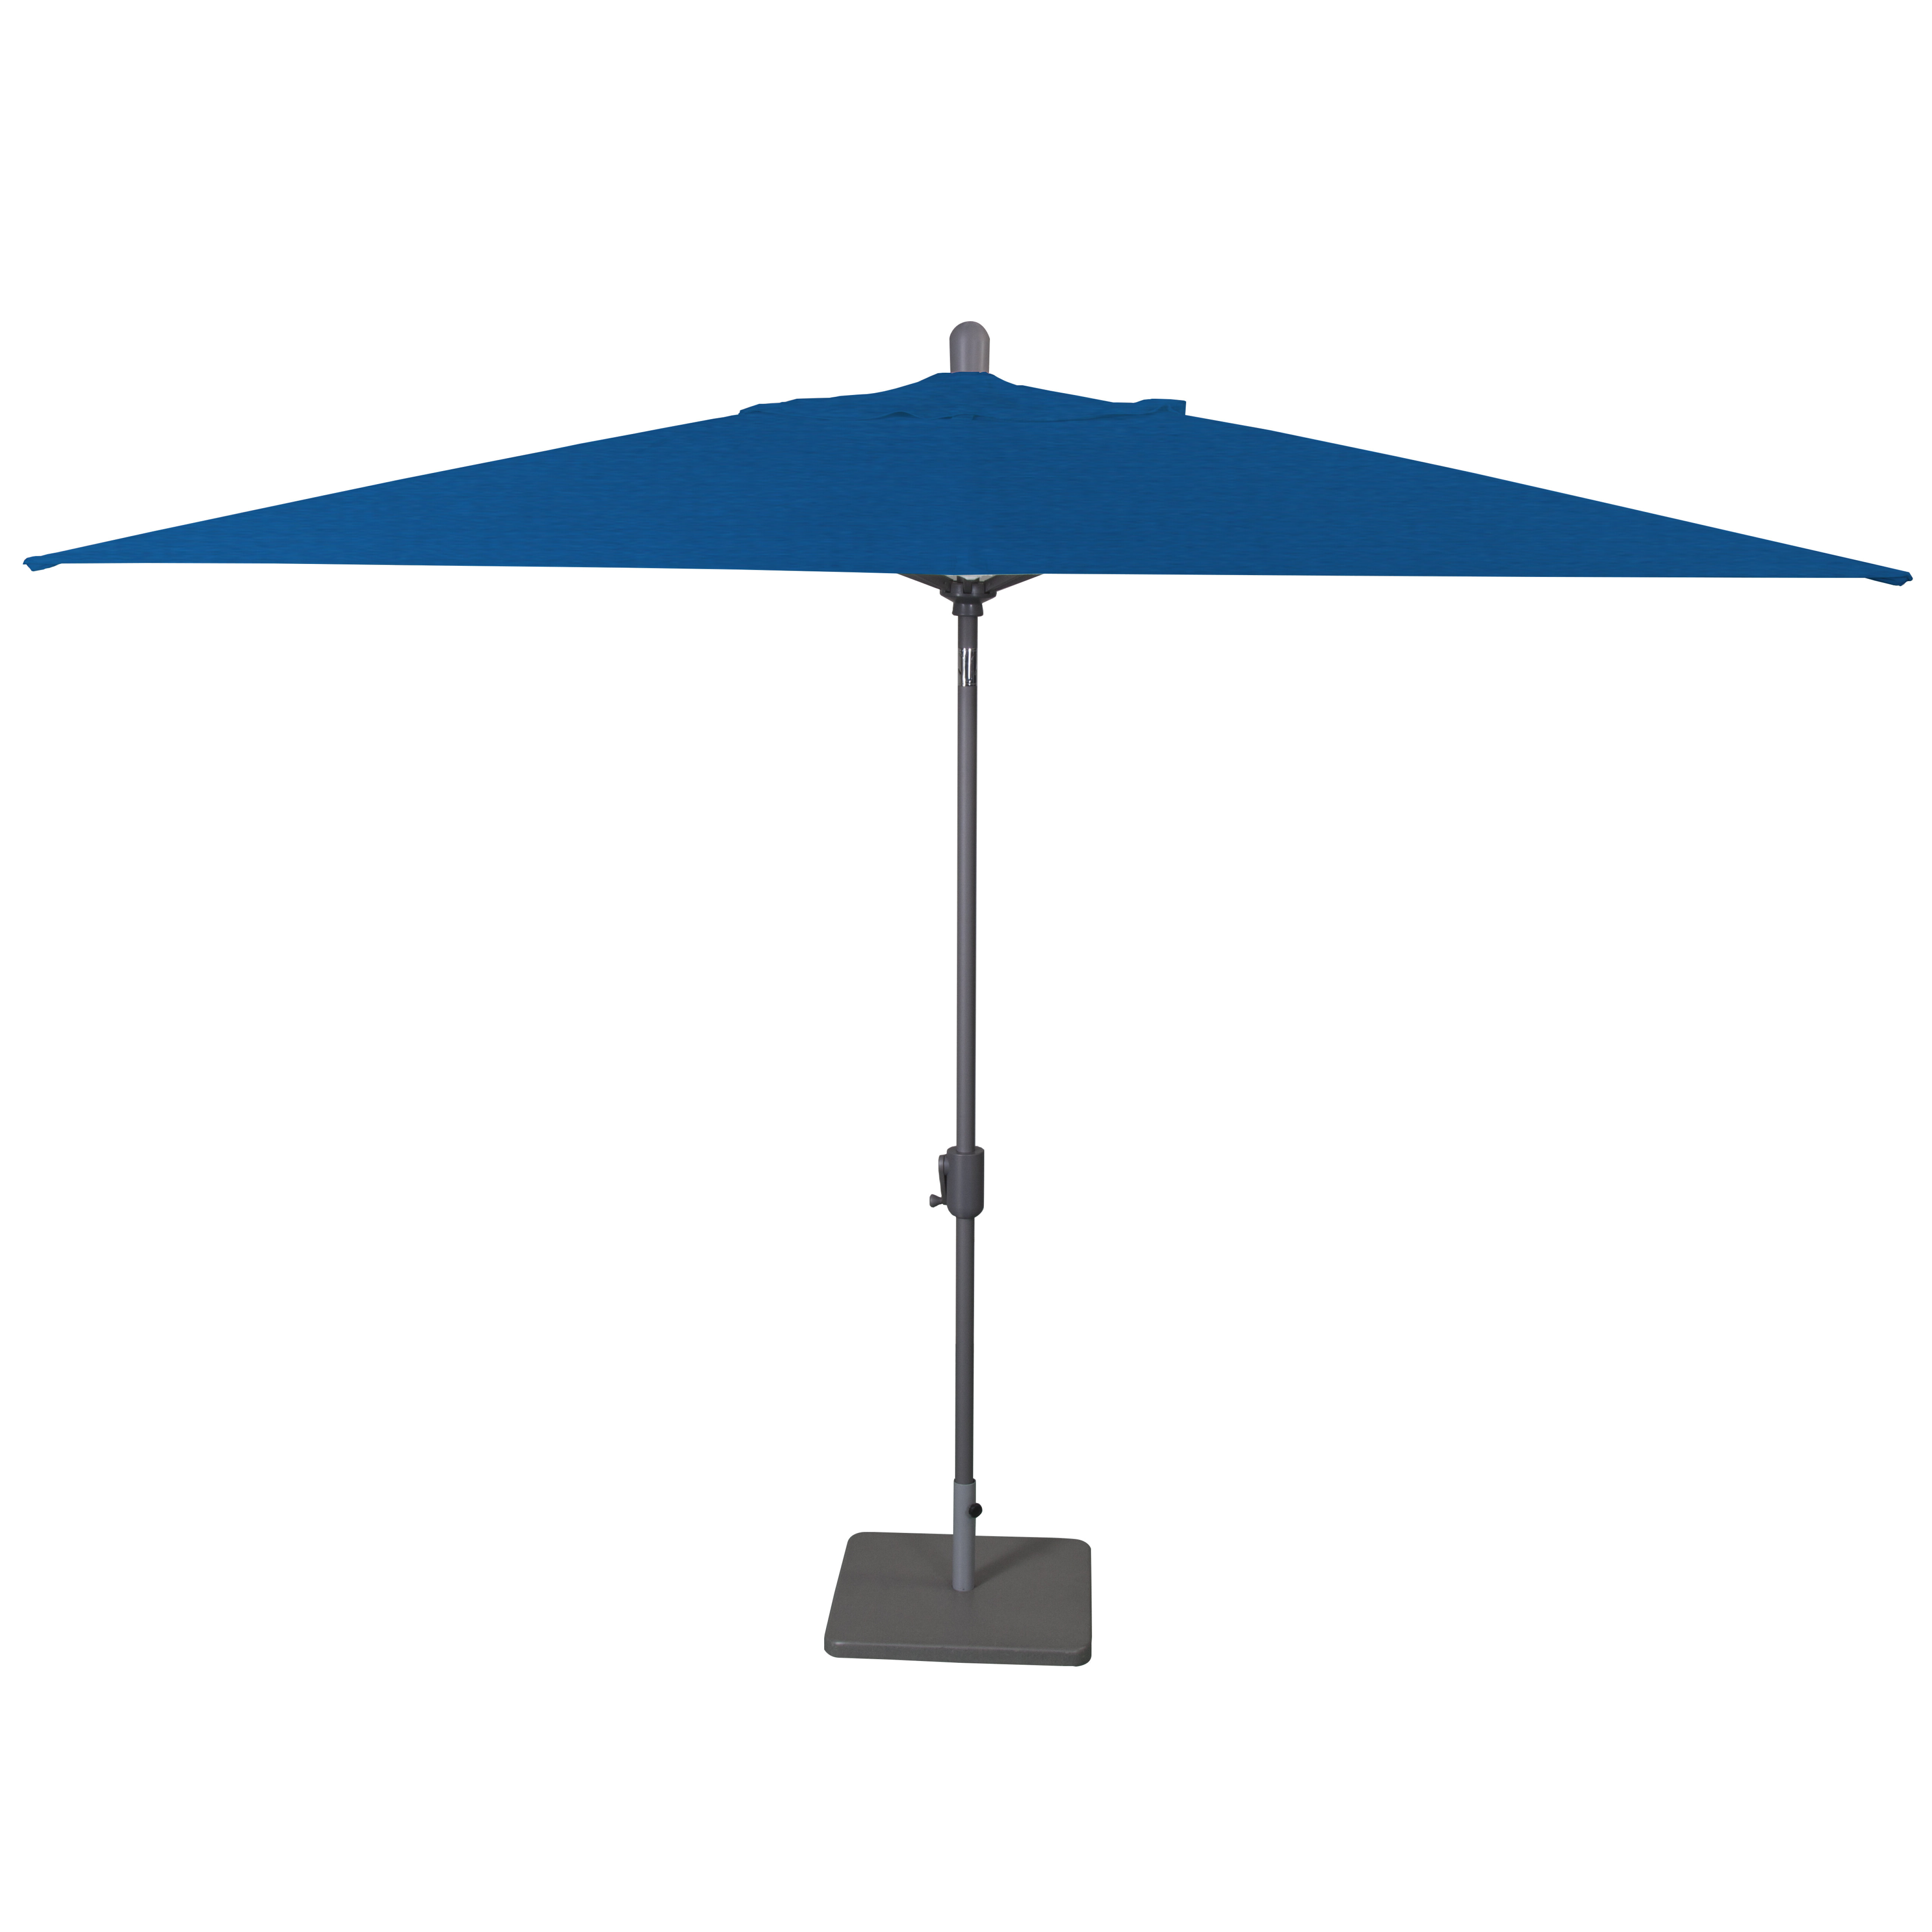 Featured Photo of Wieczorek Auto Tilt Rectangular Market Sunbrella Umbrellas